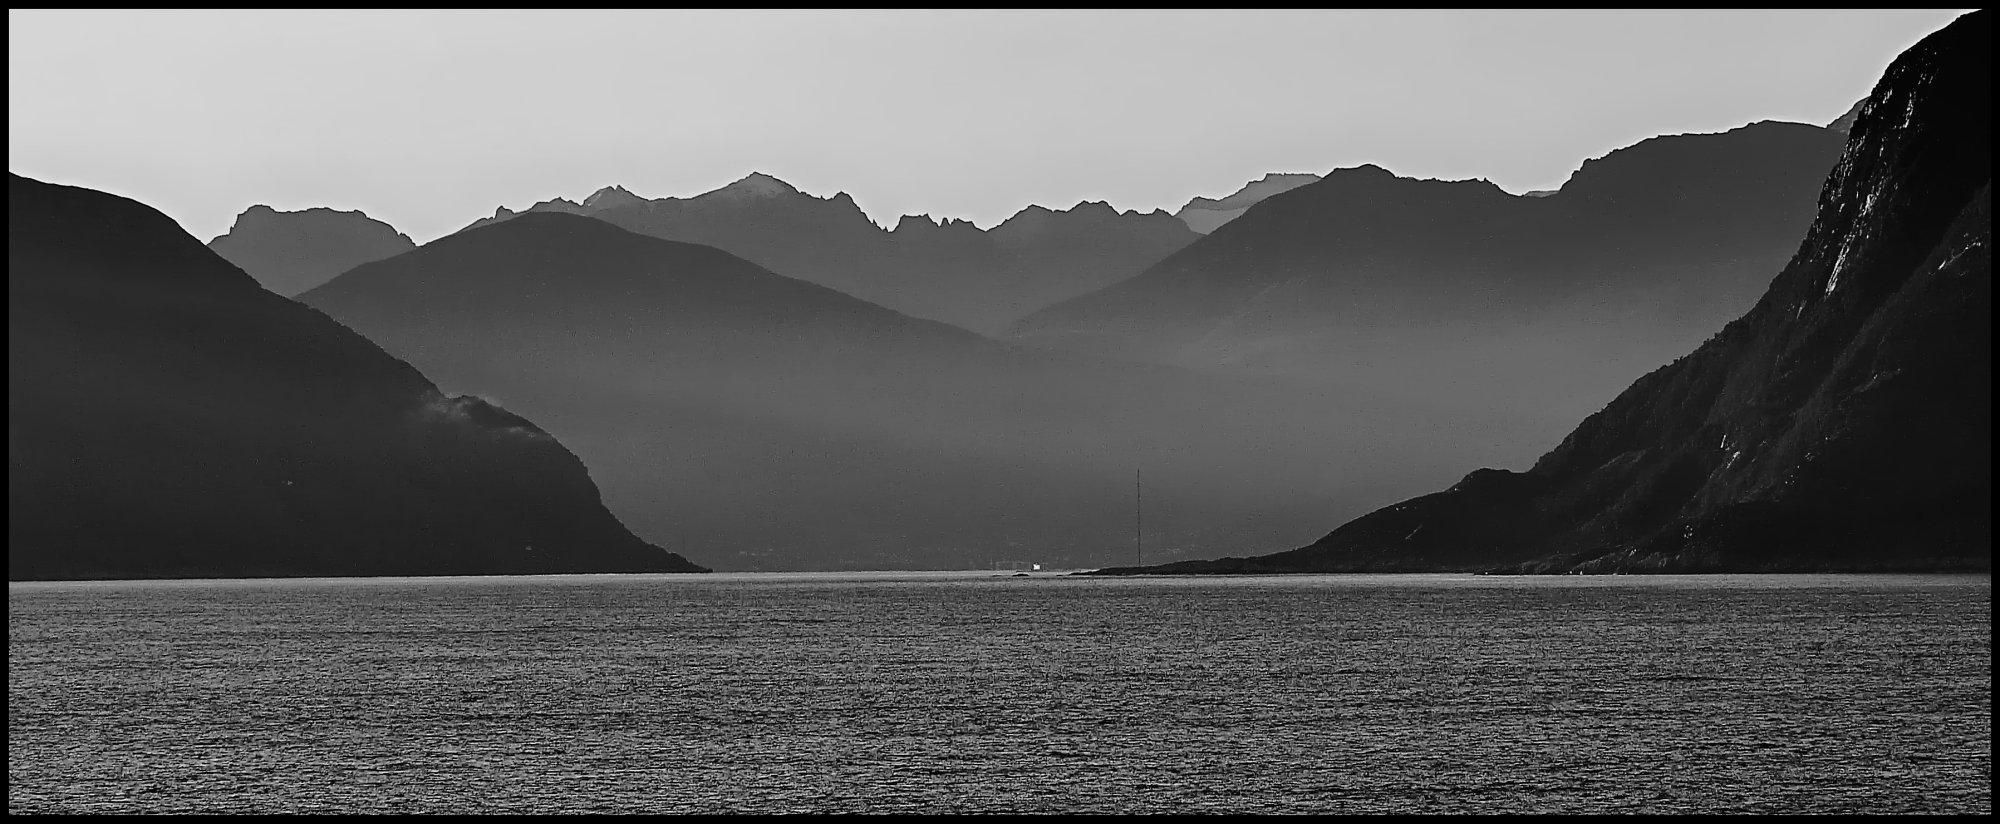 Approaching Geiranger Fjord